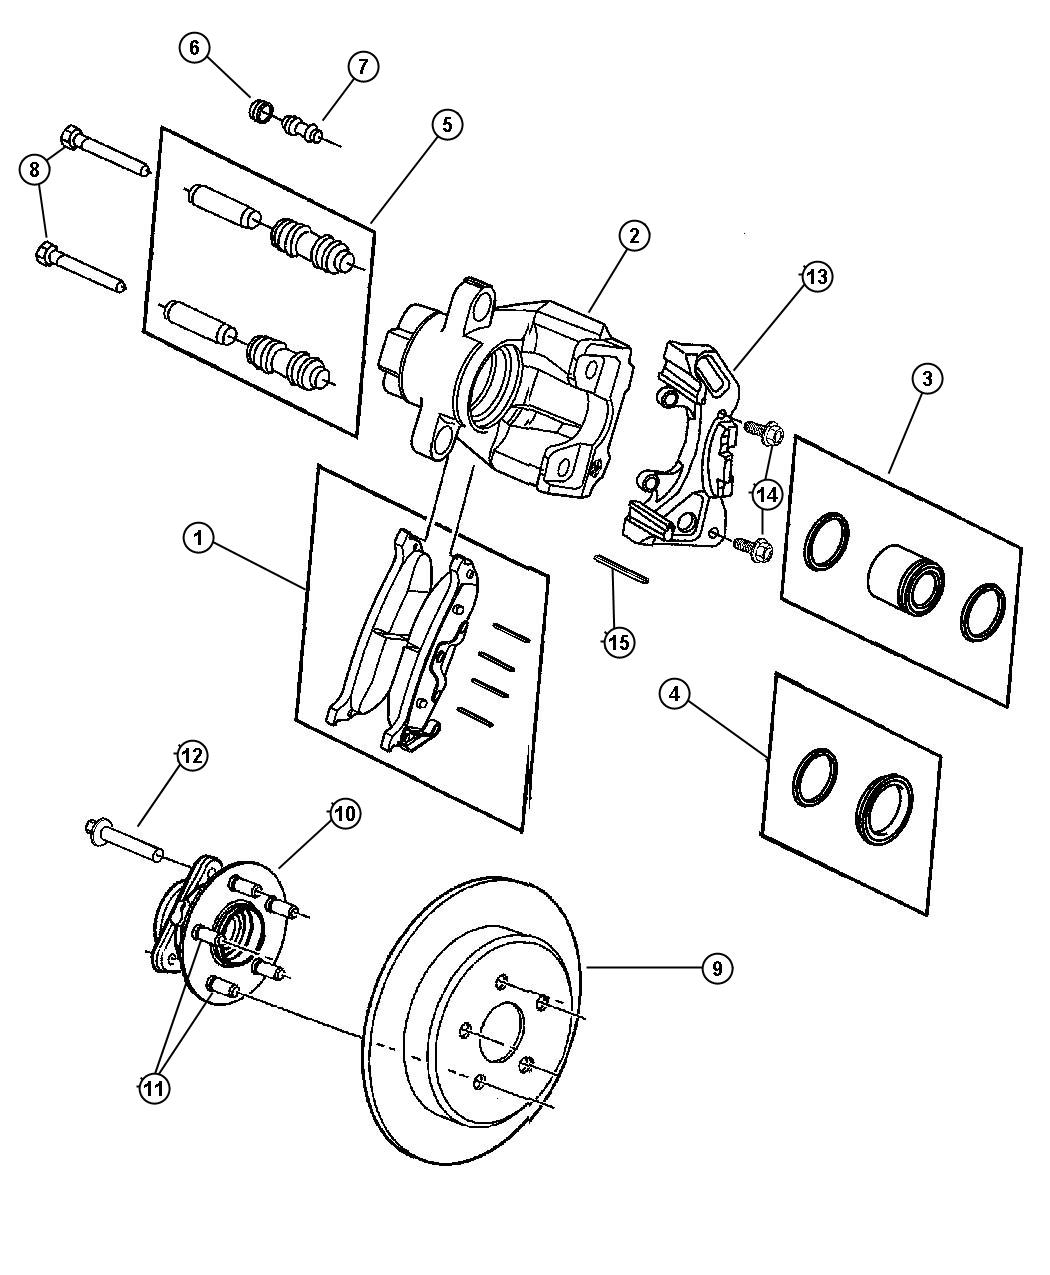 Dodge Caliber Rotor Brake Brakes Suspension Rear